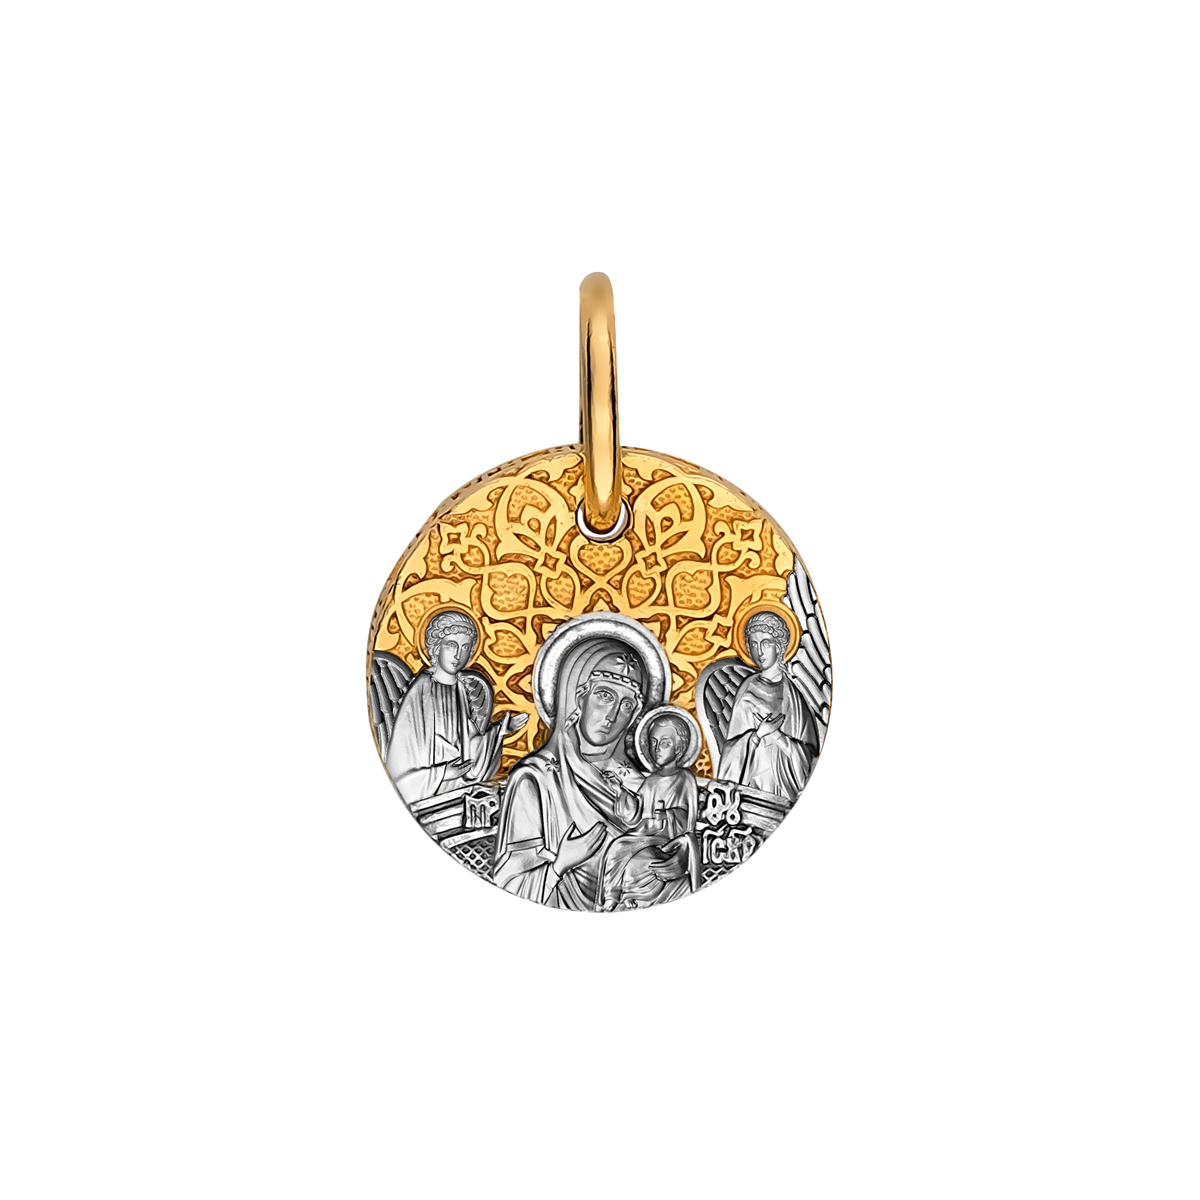 Образок «Божия Матерь «Всецарица» 02.117